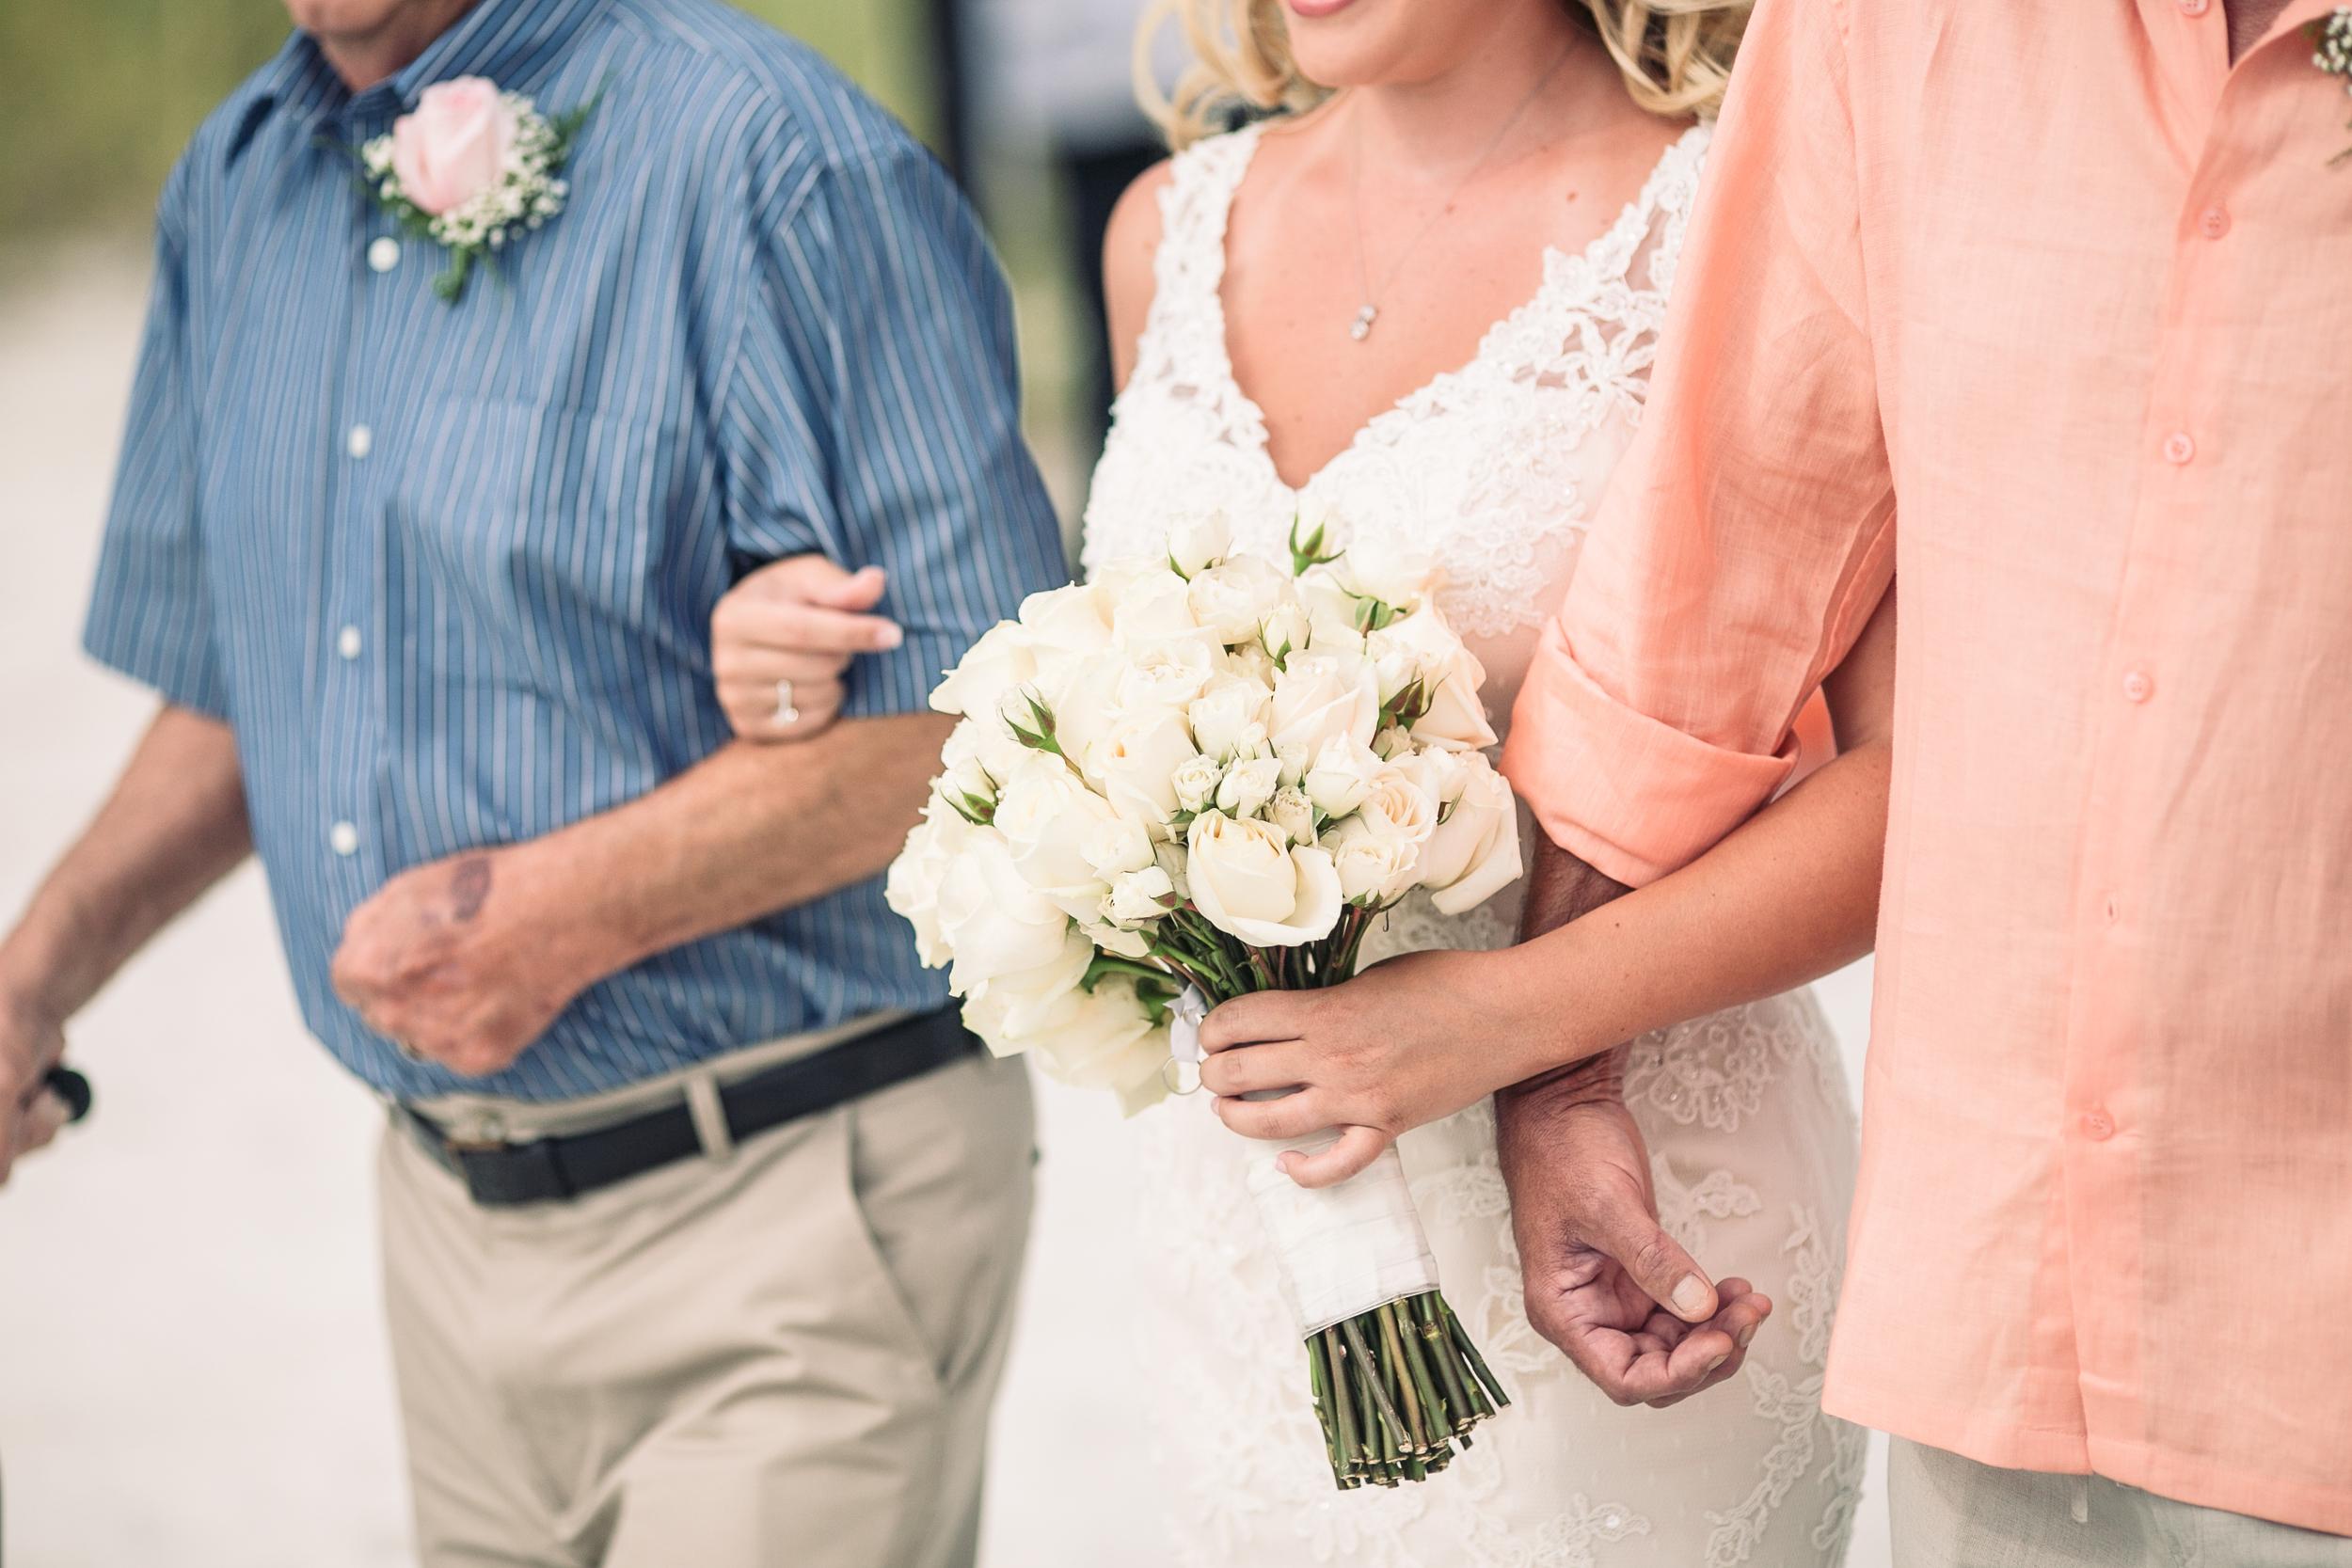 Harris wedding (47 of 72).JPG